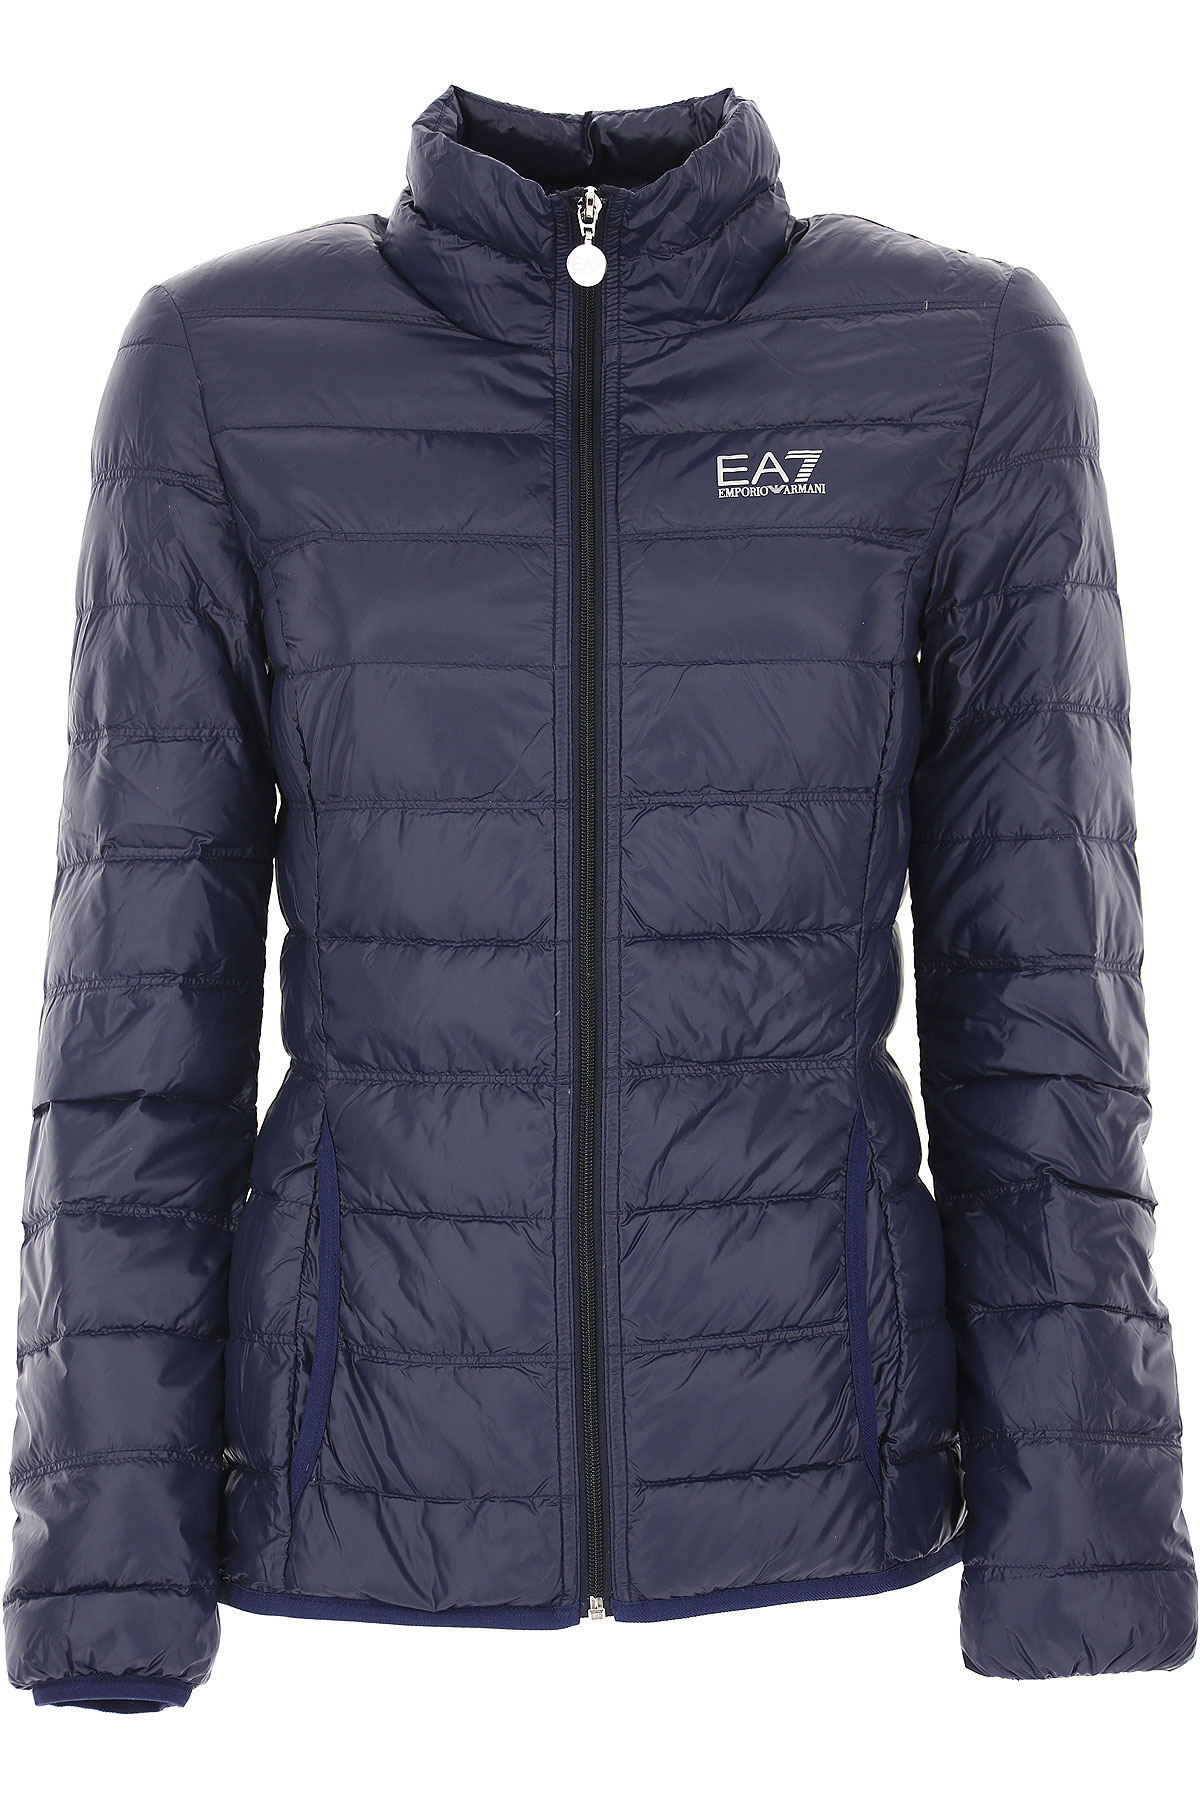 Image of Giorgio Armani Jacket for Women, Ultralight 100 Gr Jacket, Blue, polyamide, 2017, 10 8